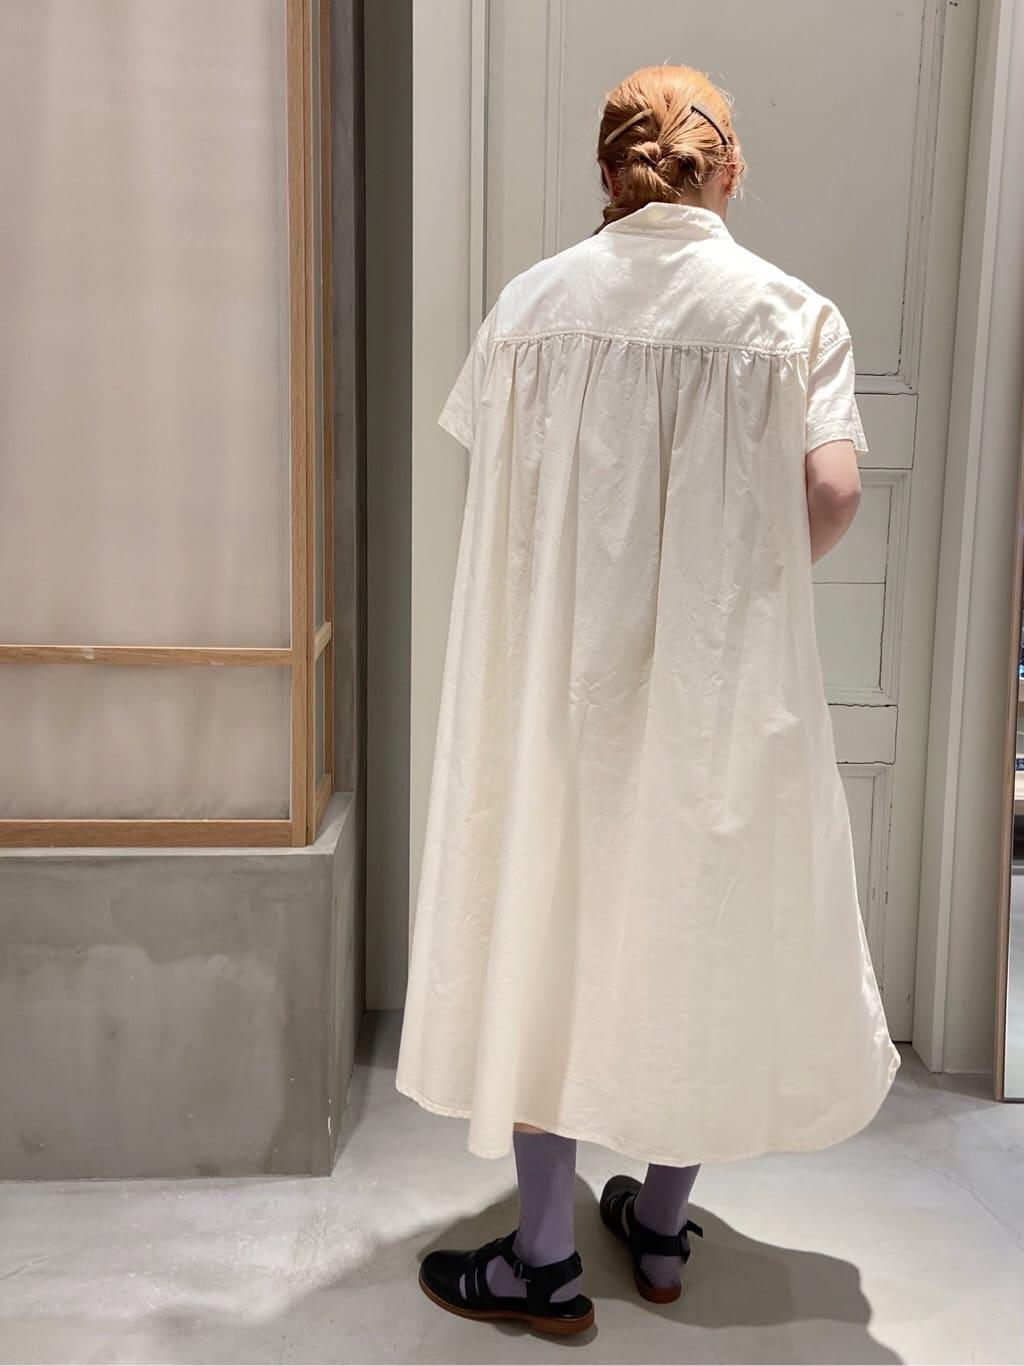 bulle de savon 渋谷スクランブルスクエア 身長:160cm 2021.06.16